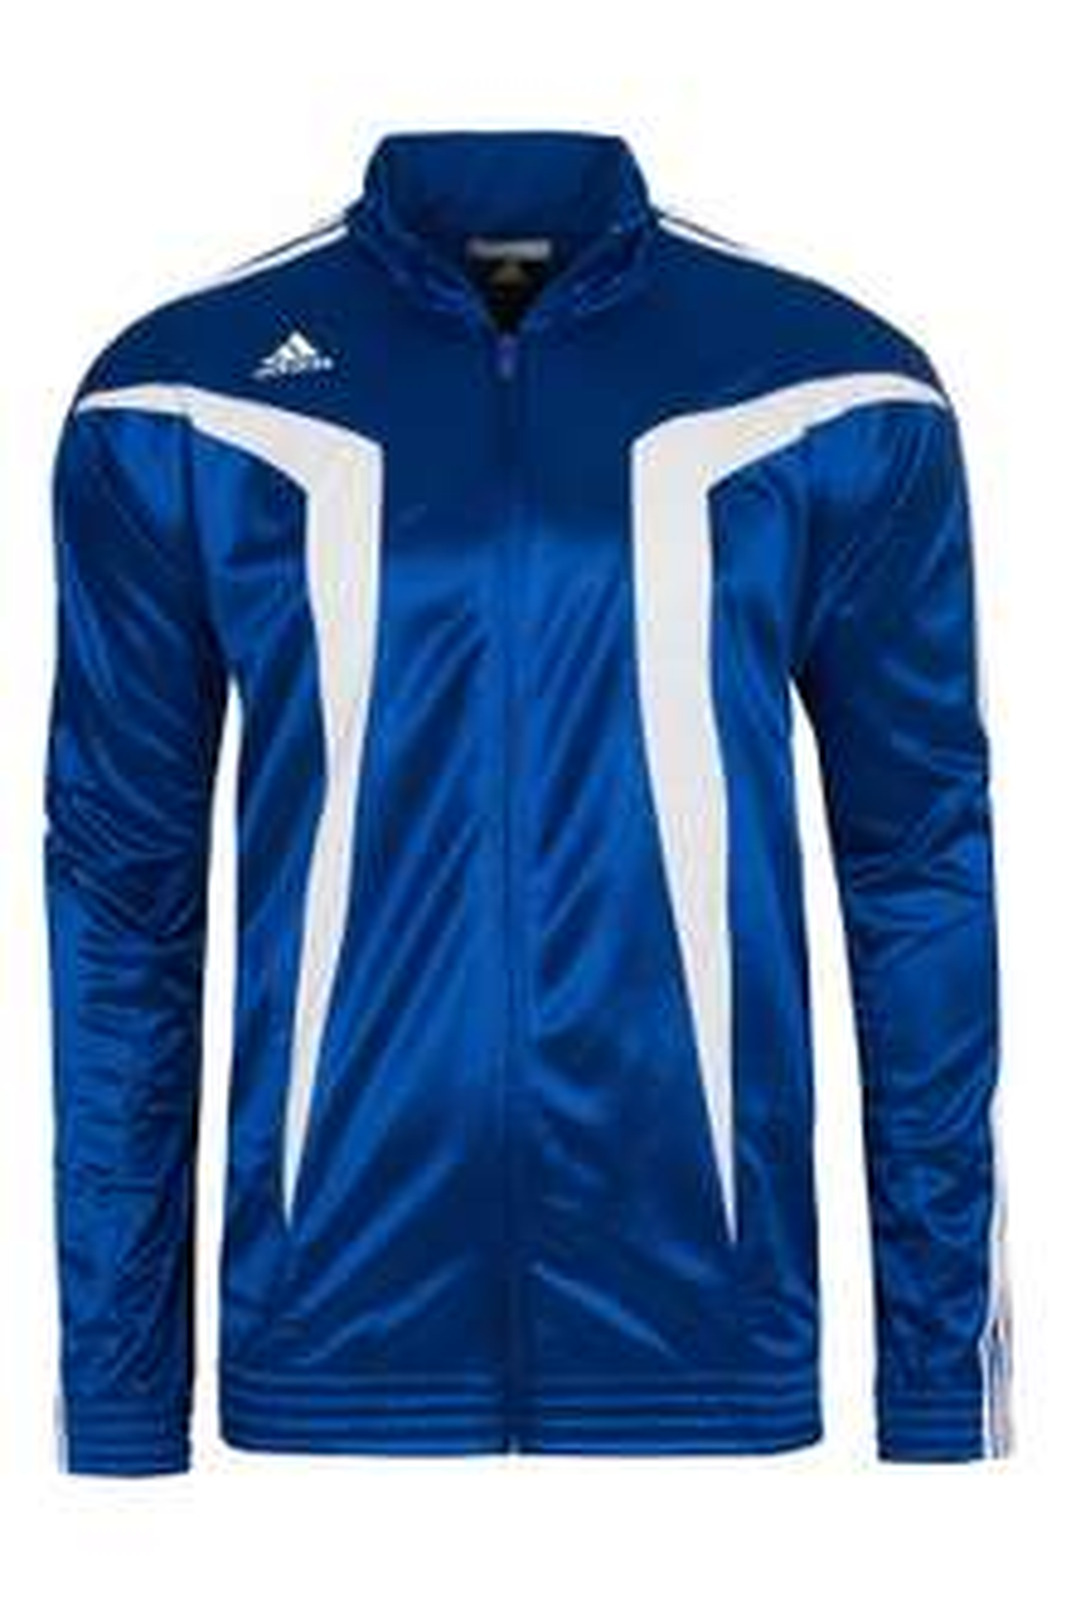 (Megagrößendeal) adidas Euro Club Herren Basketball Trainingsjacke oder Trainingshose in Blau @ outlet46.de